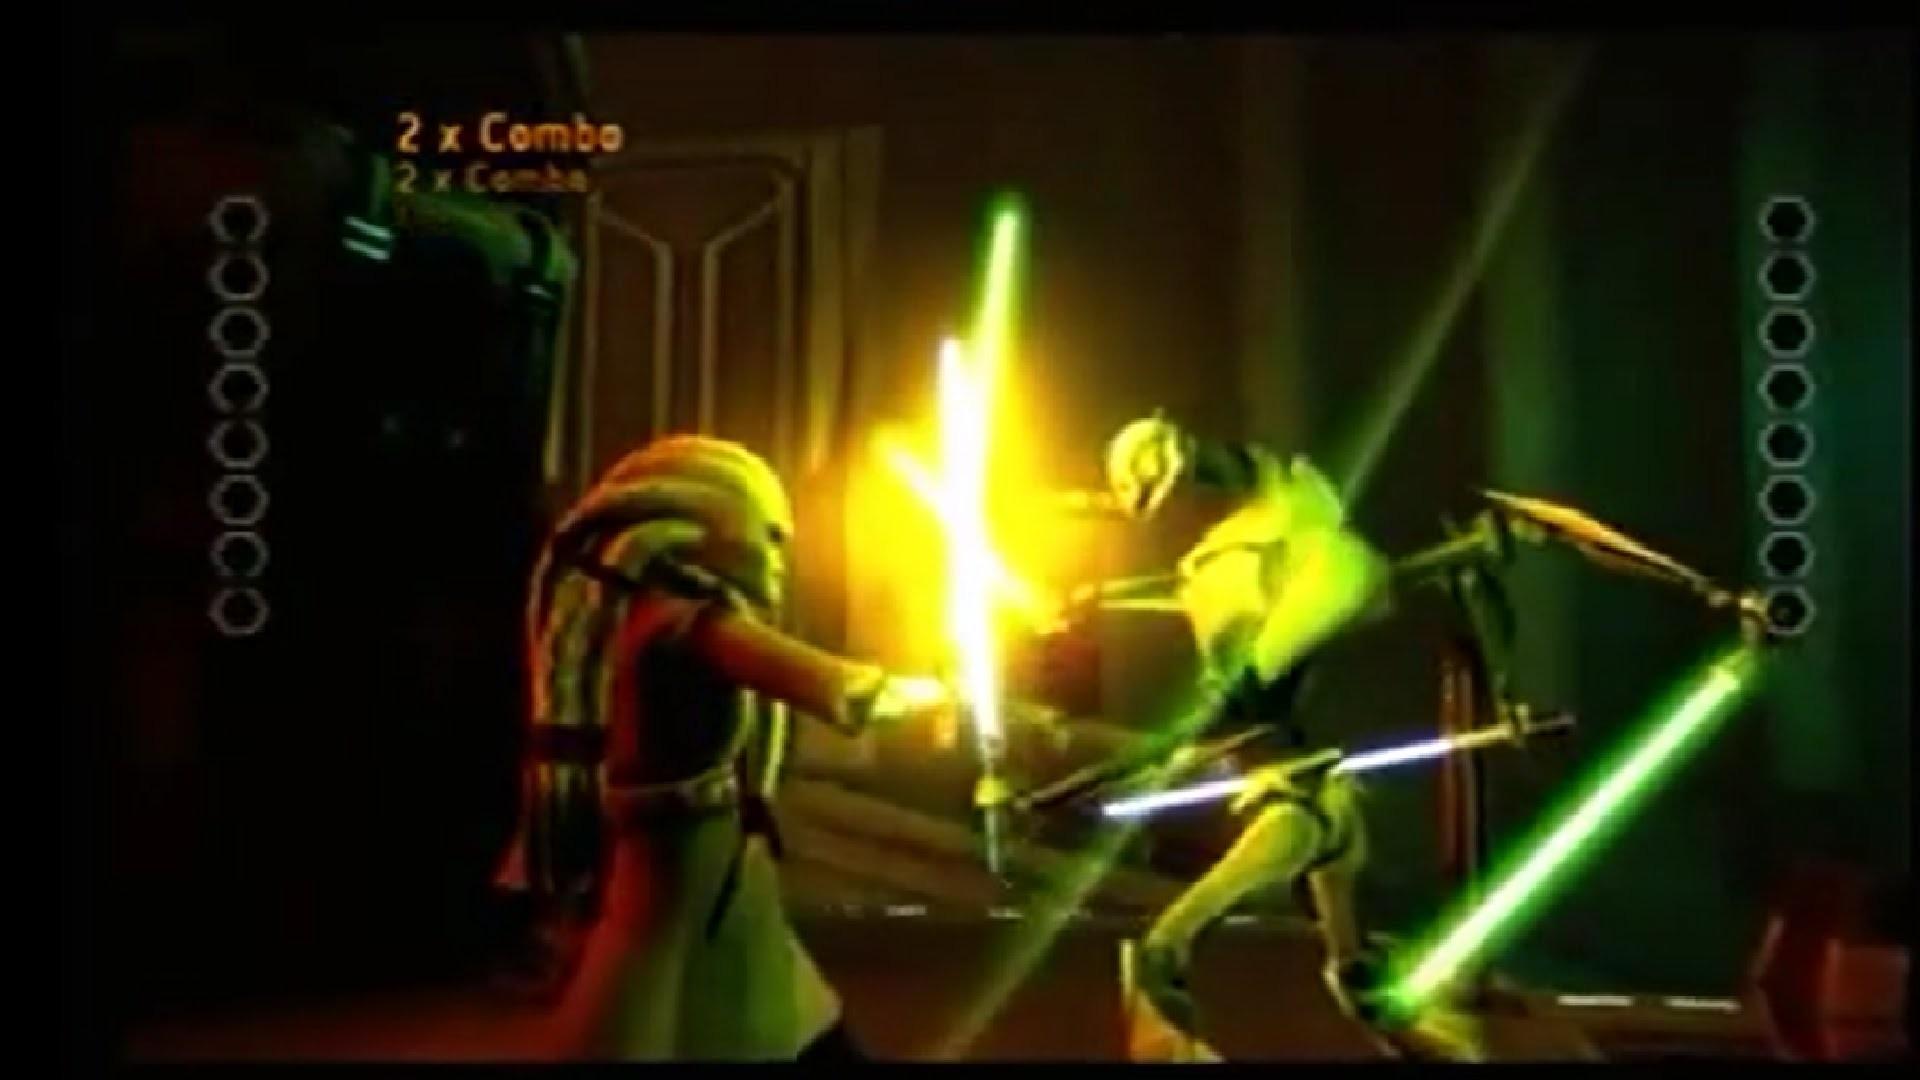 Star Wars Kit Fisto vs General Grievous